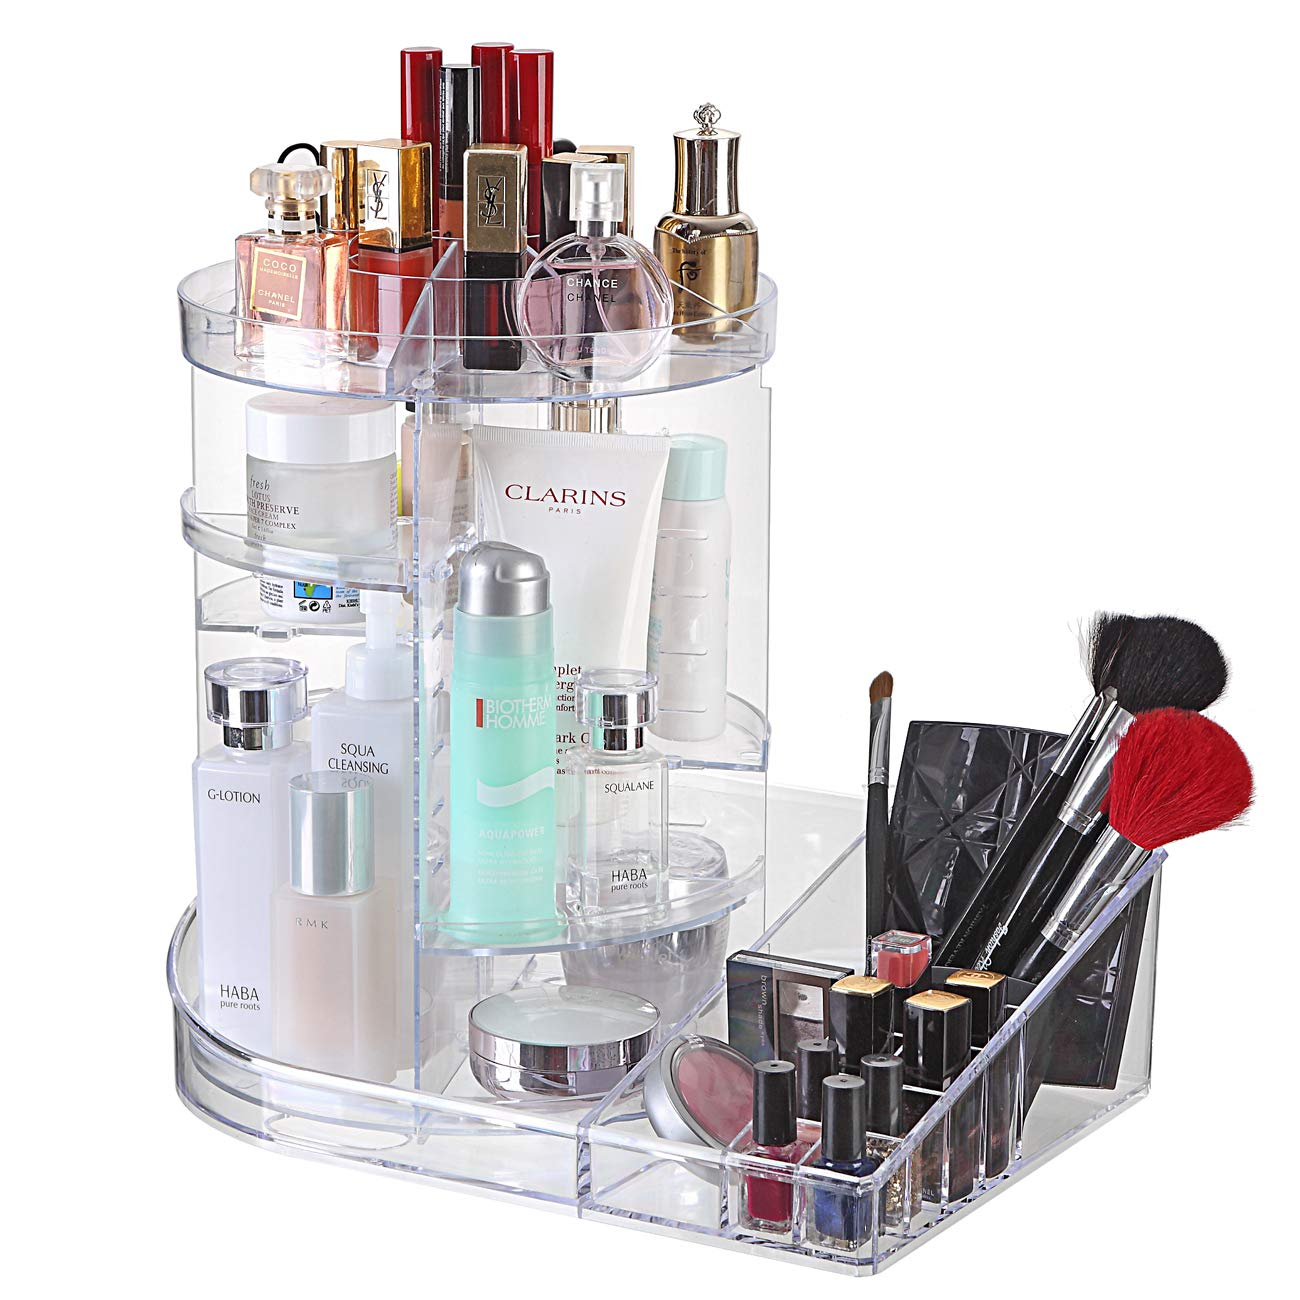 Ogrmar Adjustable 360 Degree Rotating Makeup Organizer Tray Large Capacity Cosmetics Carousel Storage Rack Fits Toner, Creams, Makeup Brushes, Lipsticks and More Transparent